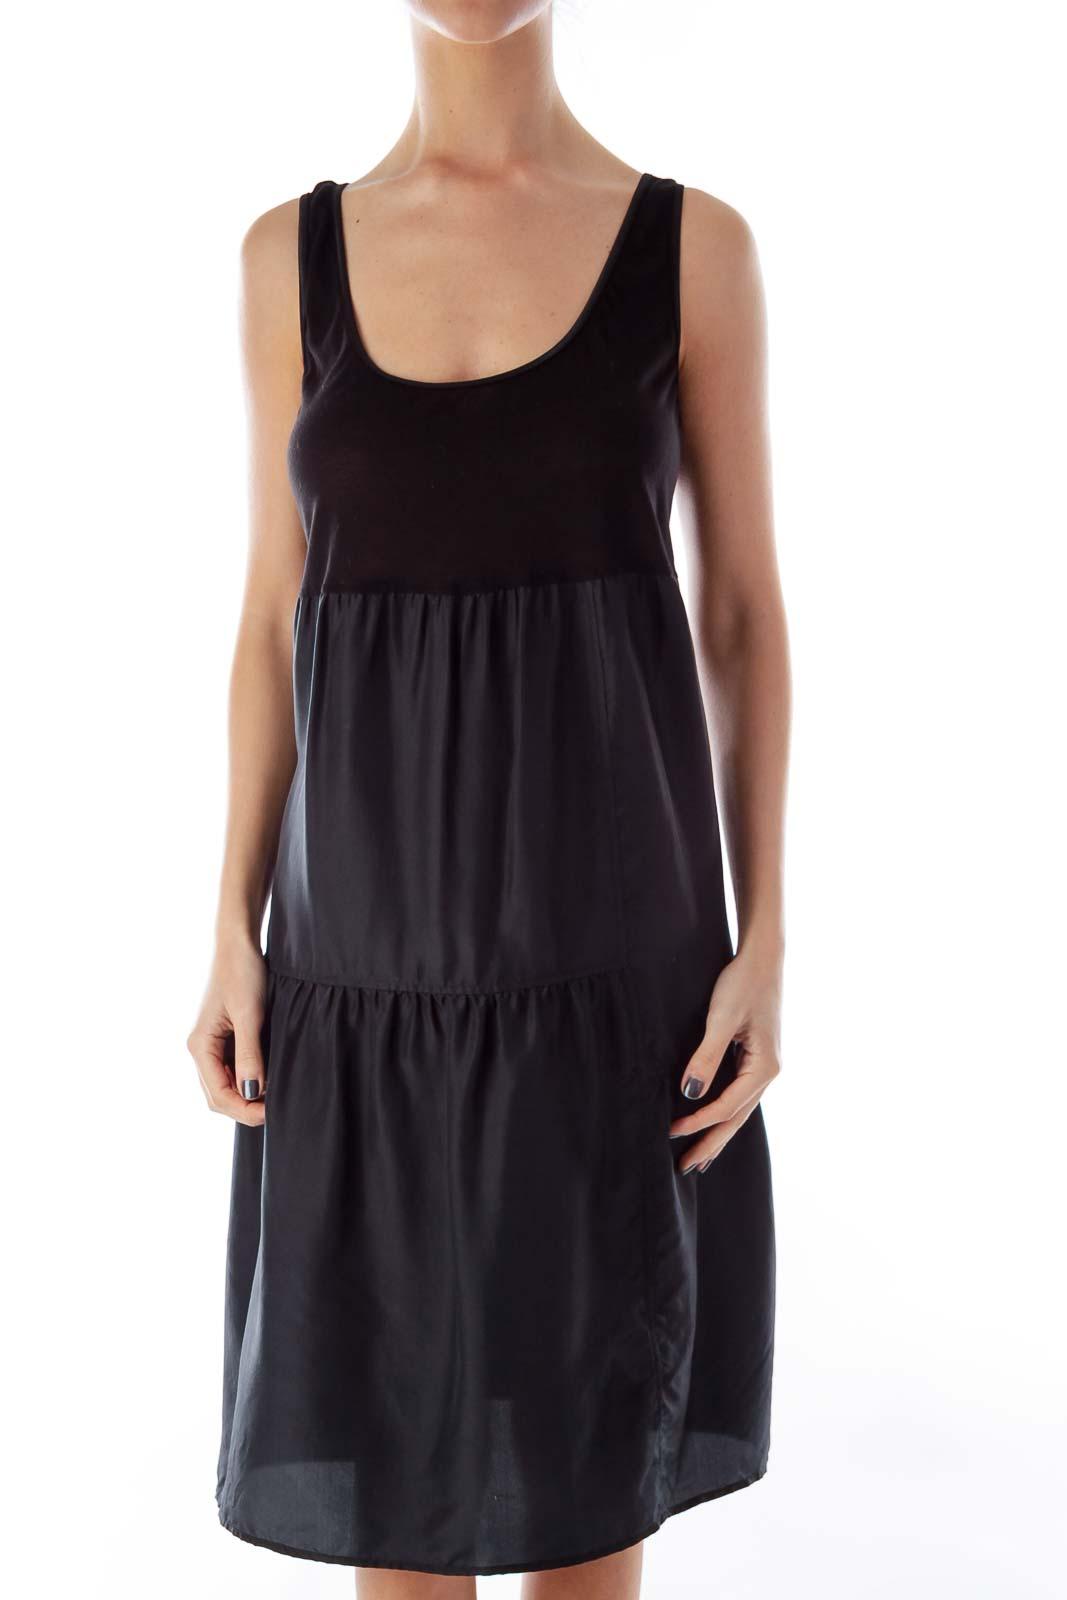 Black Layered Dress Front